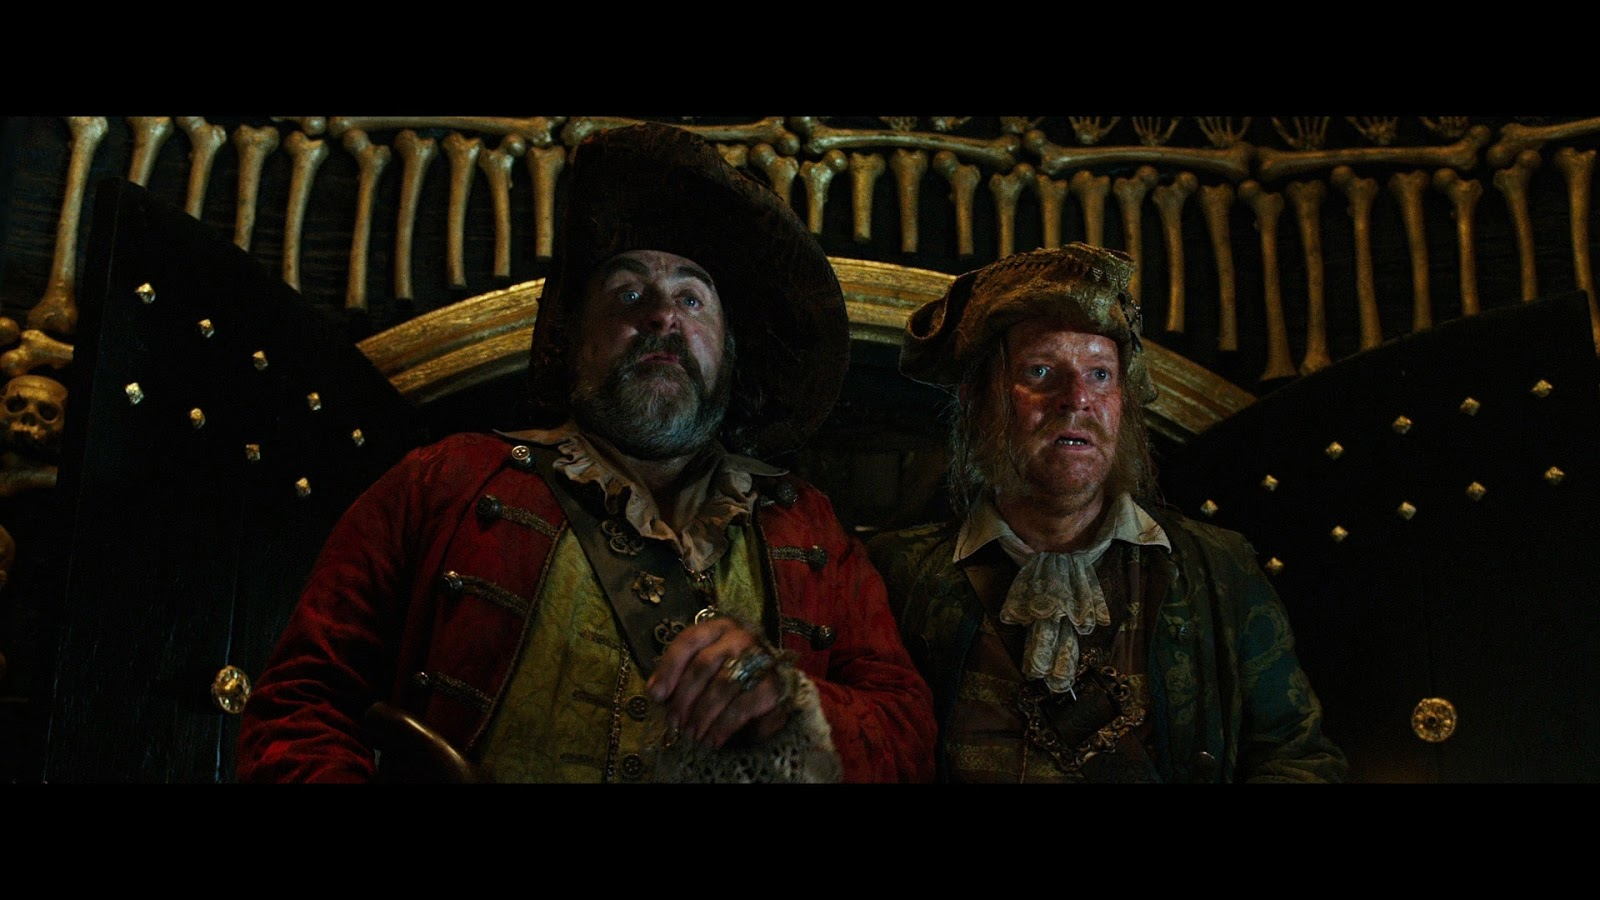 Piratas del Caribe 5: La venganza de Salazar (2017) Full HD 1080p Español Latino - Castellano - Ingles Captura 3